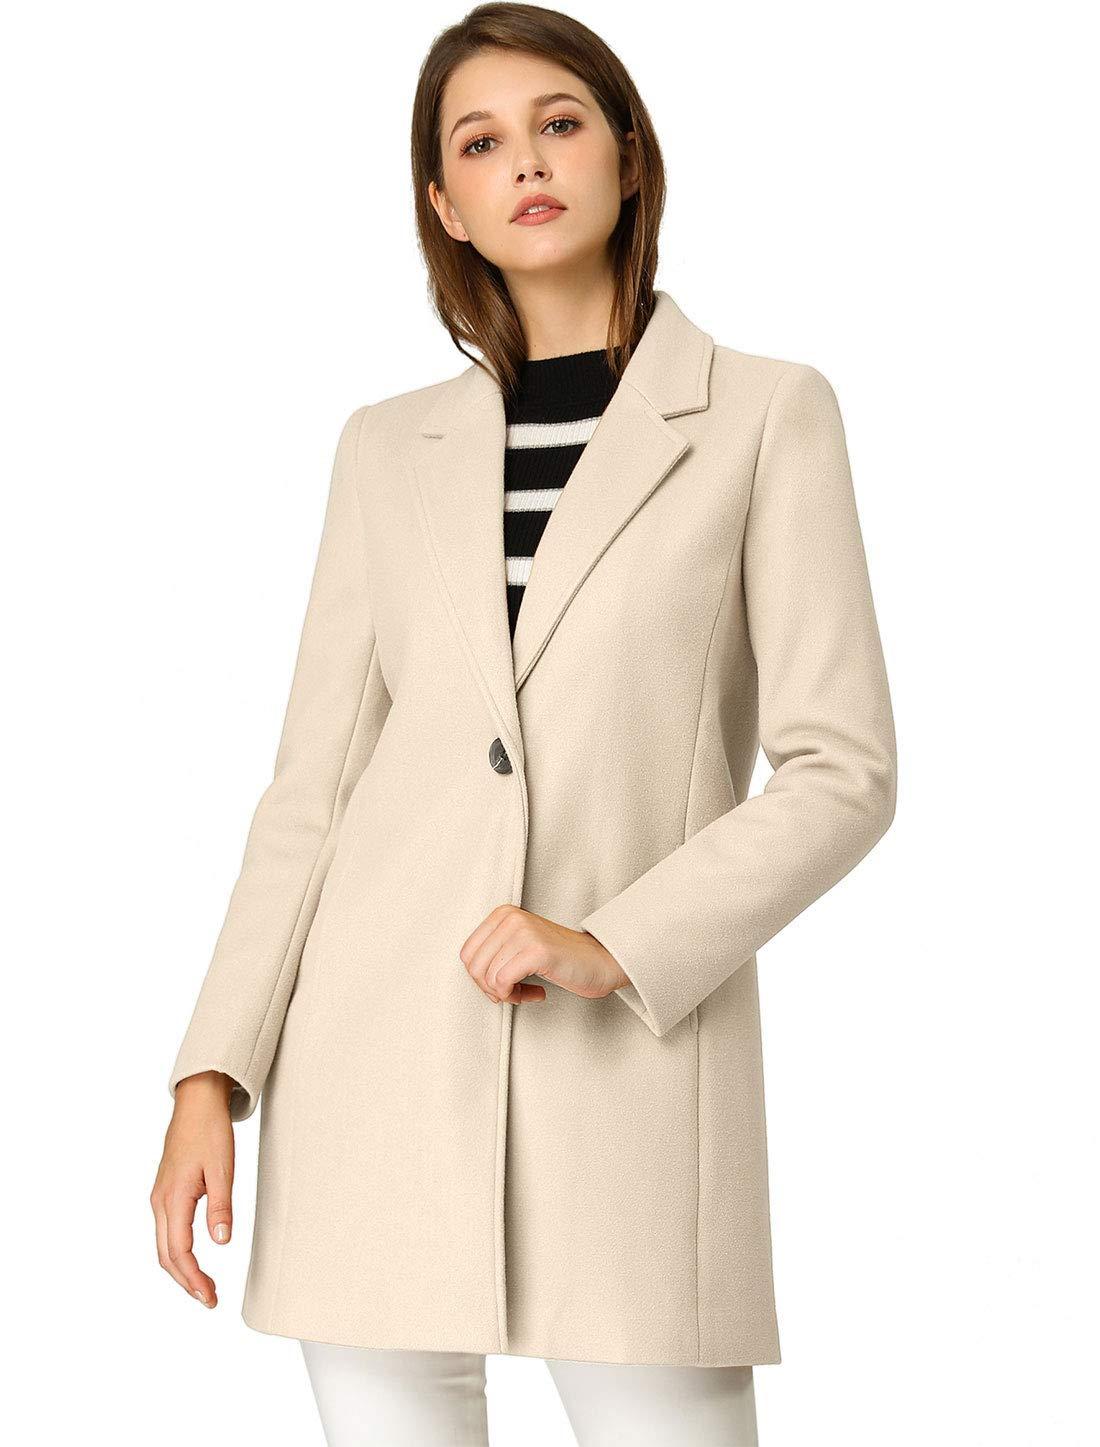 Allegra K Women's Classic Notched Lapel Long Sleeve Buttoned Long Coat